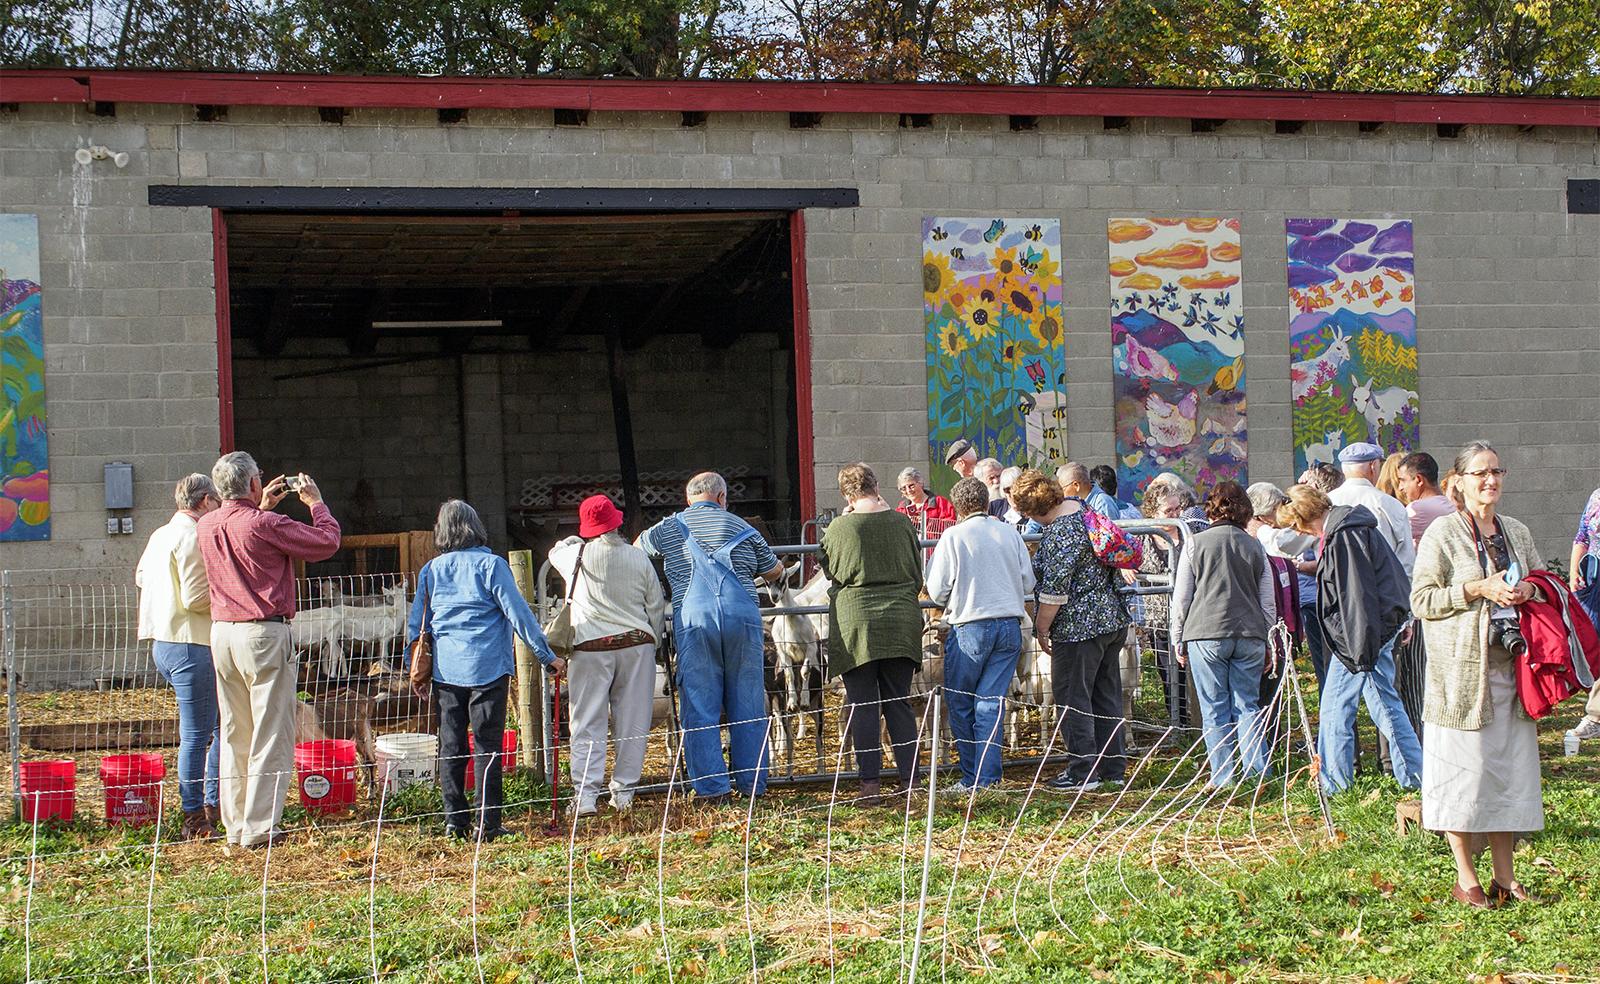 A Rural Chaplains Association focus event at a Vermont farm in Oct. 2017. Photo by Bob Klingler